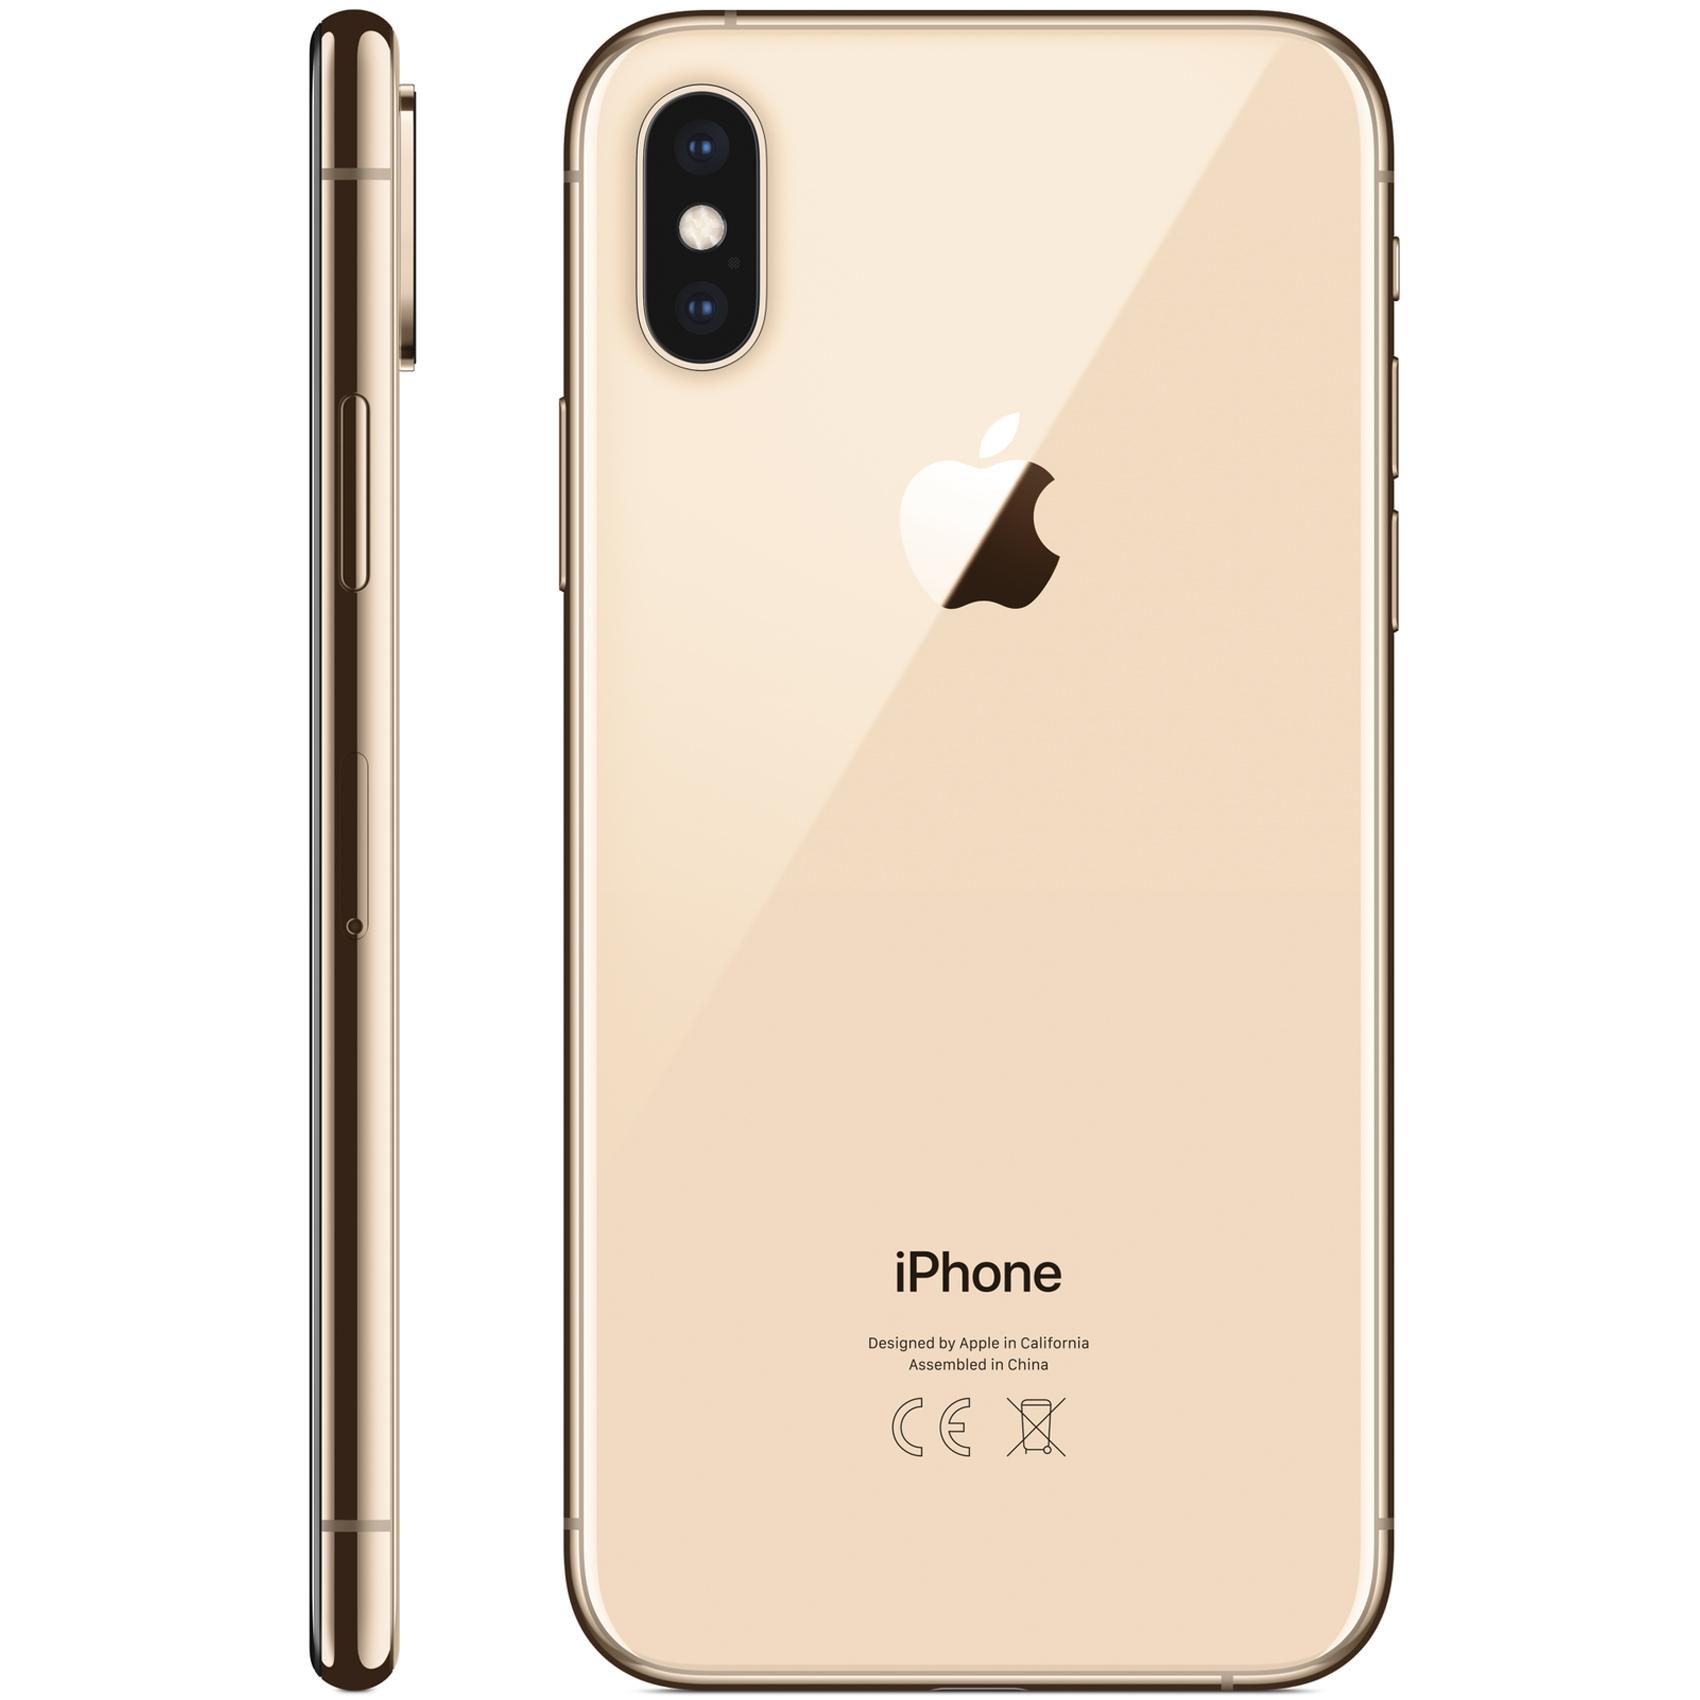 buy apple iphone xs 64gb gold online in uae carrefour uae. Black Bedroom Furniture Sets. Home Design Ideas